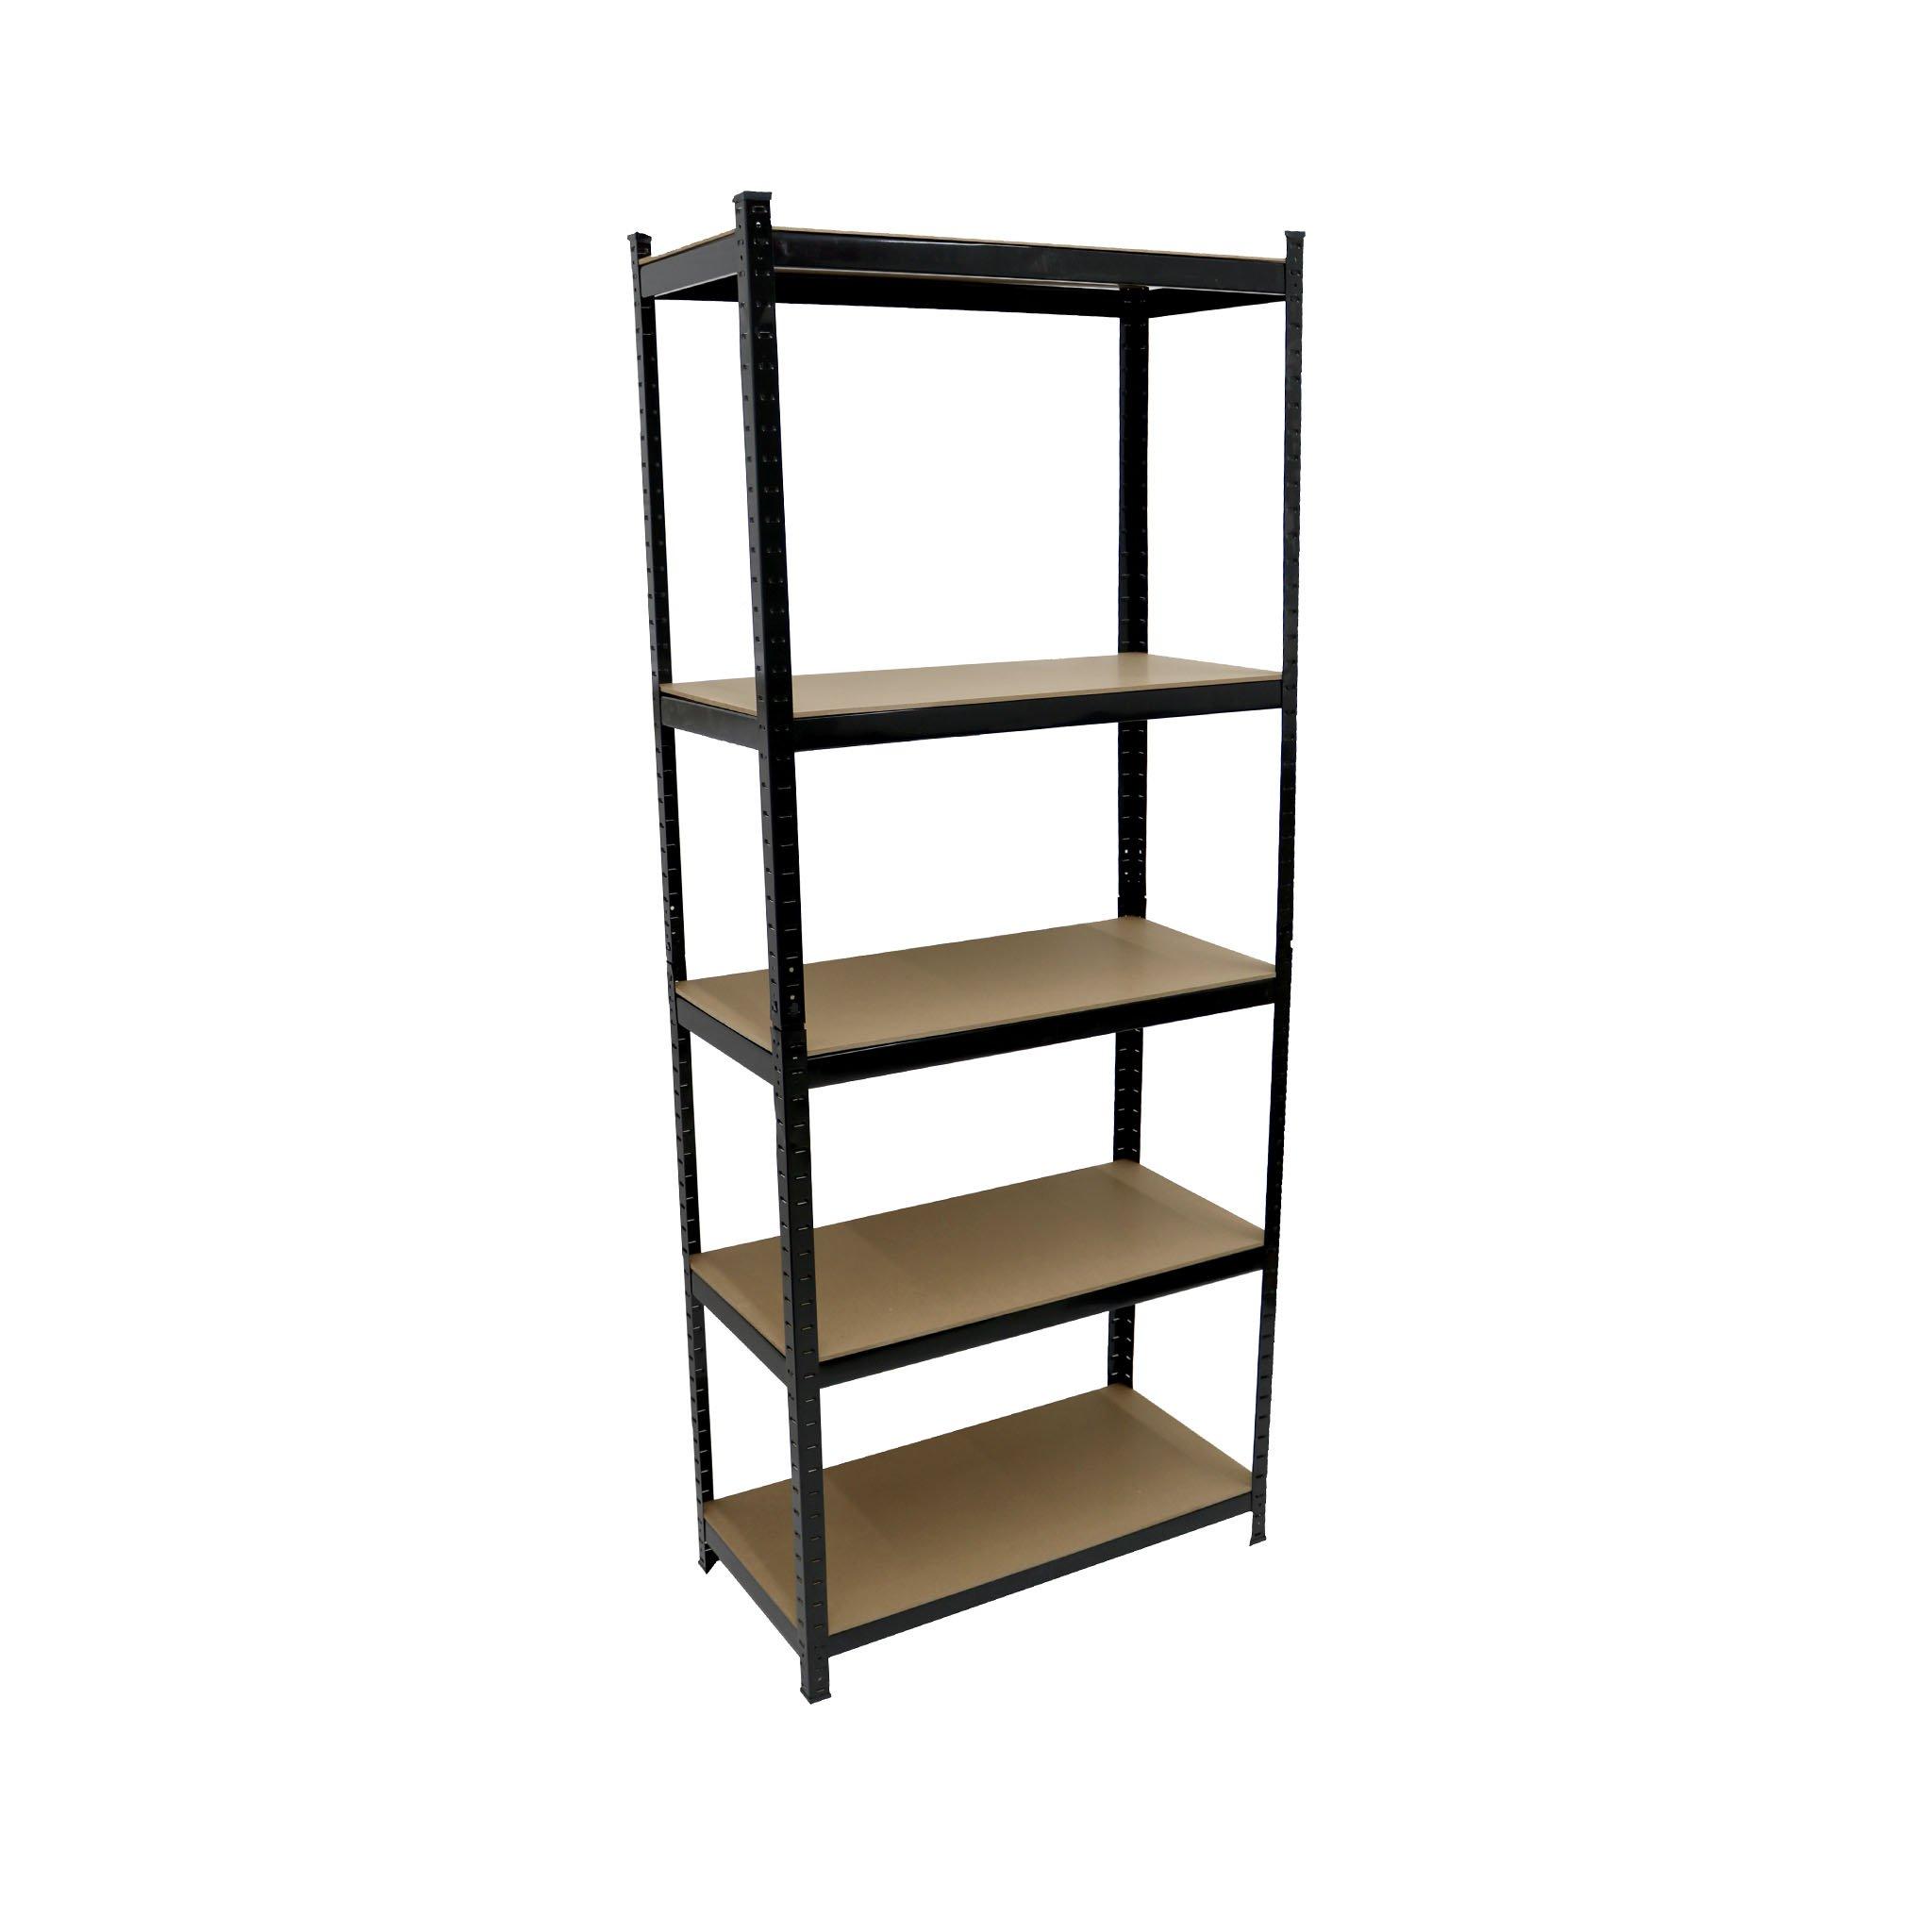 design garage hanging metal systems ideas ur custom excellent interior edsal black storage units tool cabinets shelving racks shelf cute